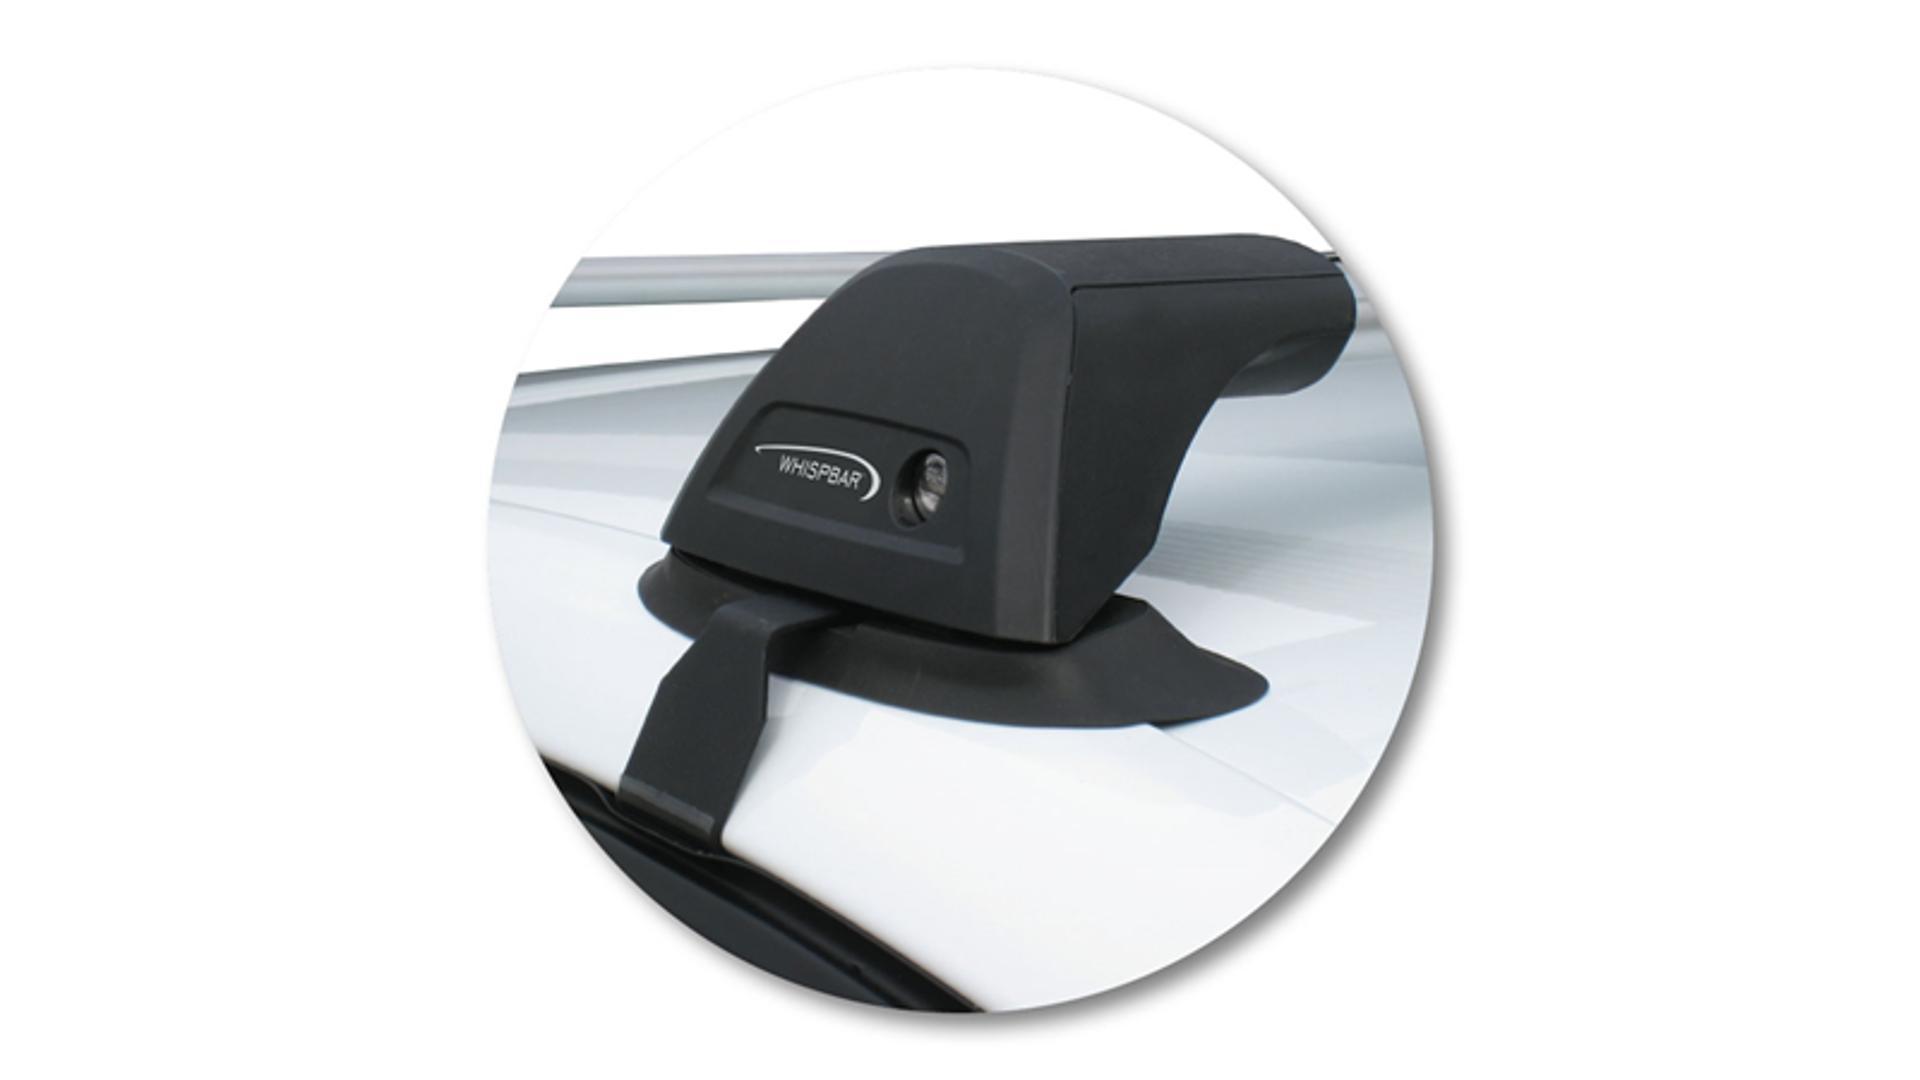 Whispbar montážní sada - Clamp Mount - K1006W